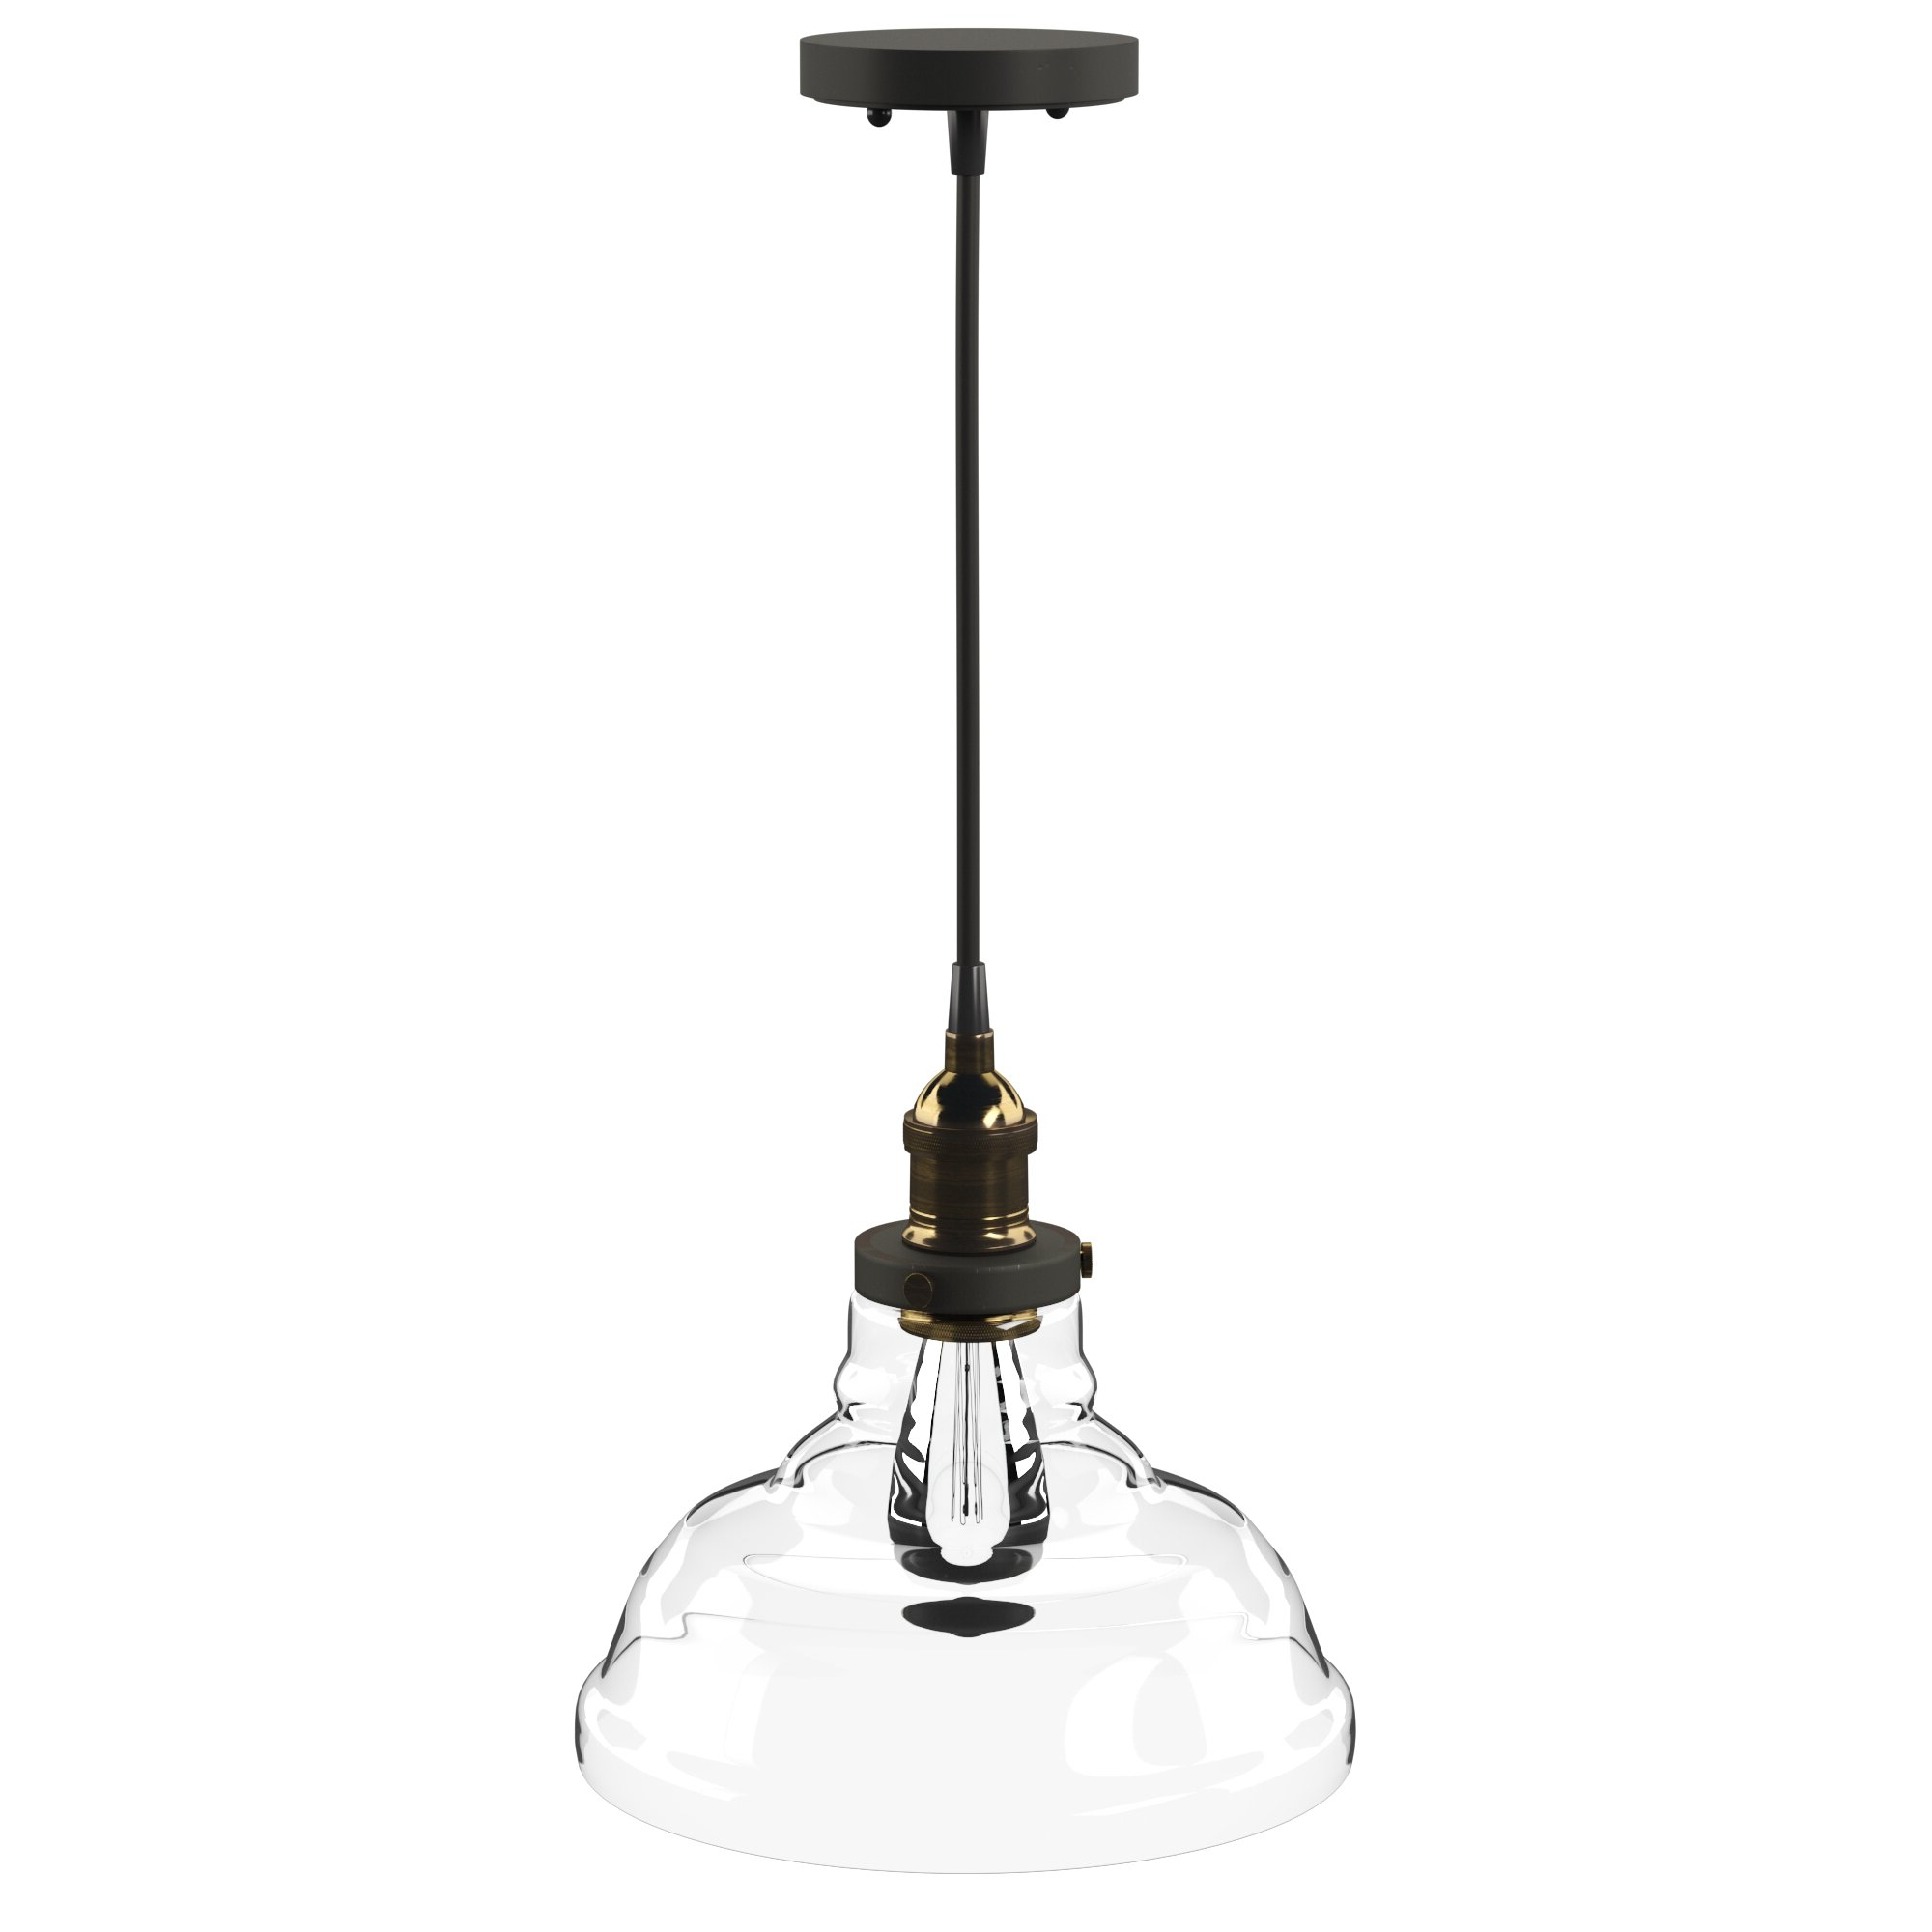 Akakios 1 Light Single Bell Pendant Regarding Recent Fresno Dome 1 Light Bell Pendants (View 3 of 20)